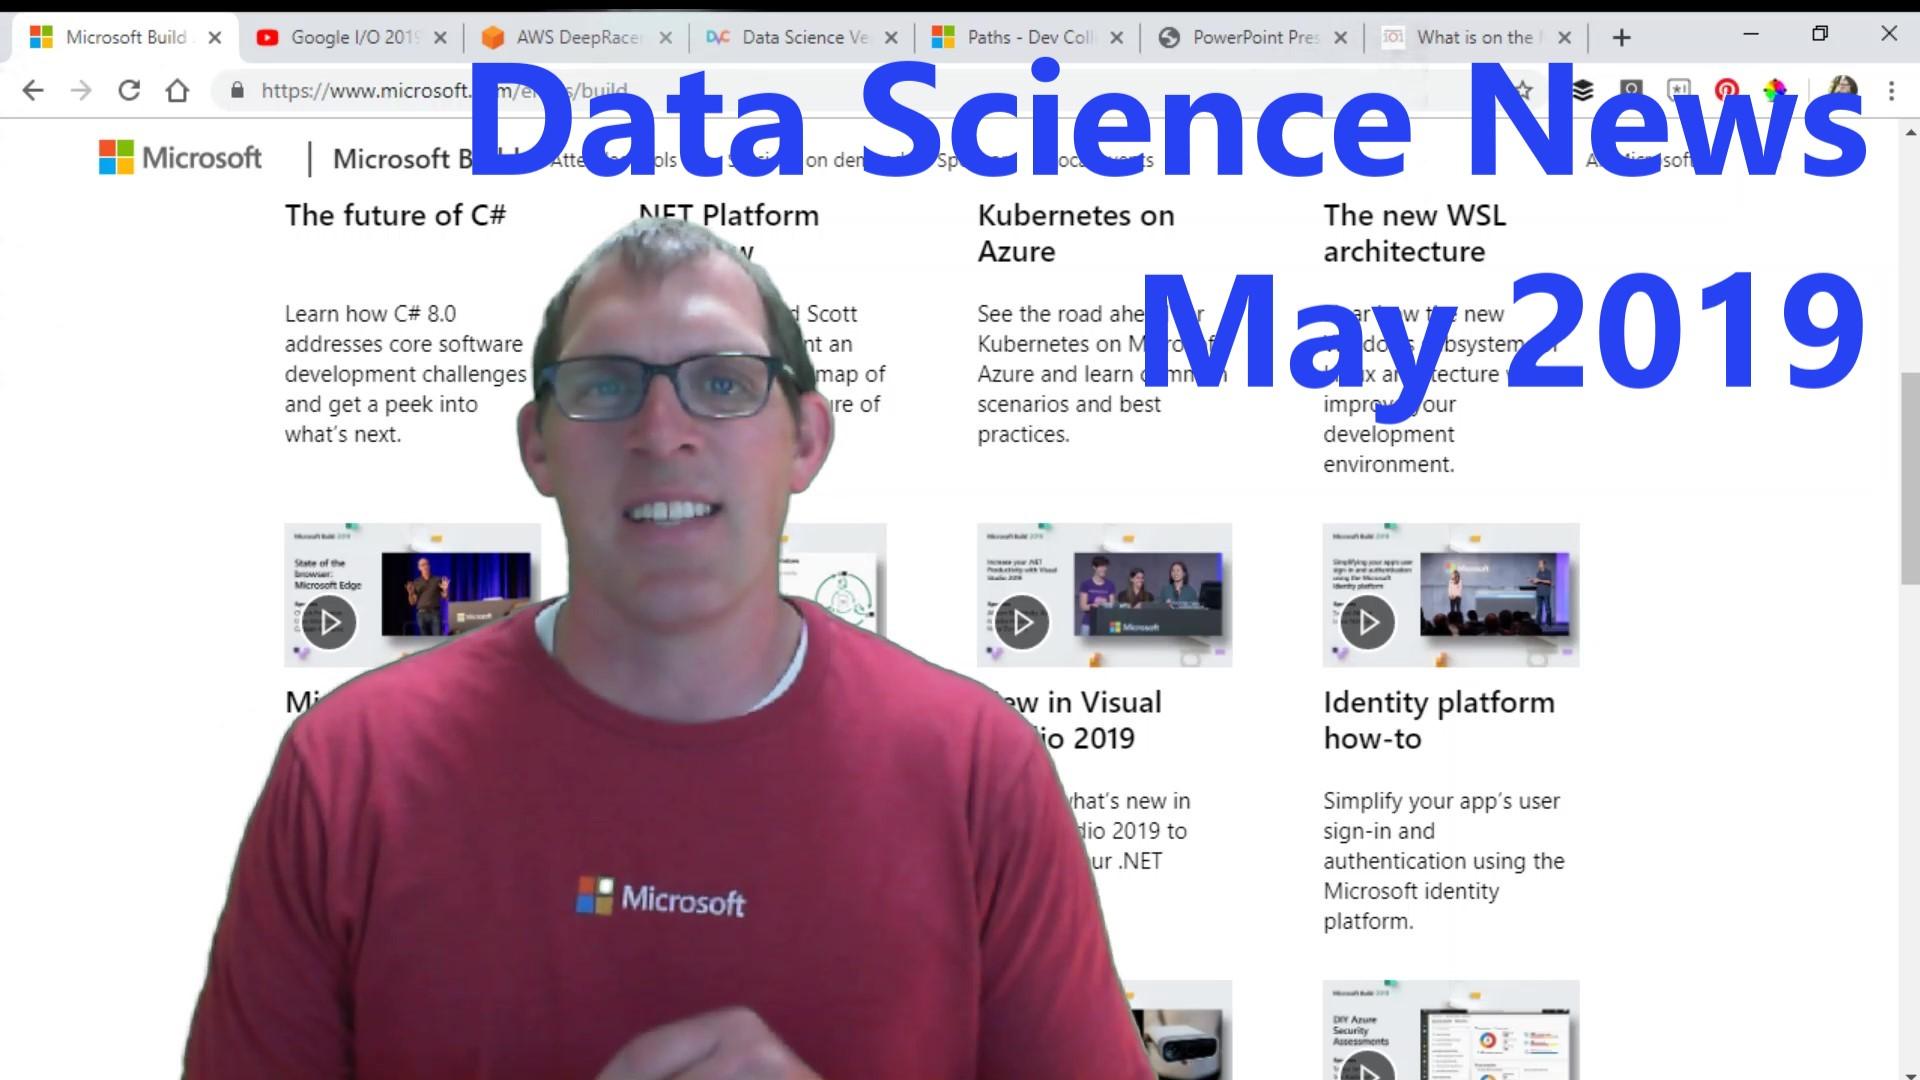 Data Science News May 2019